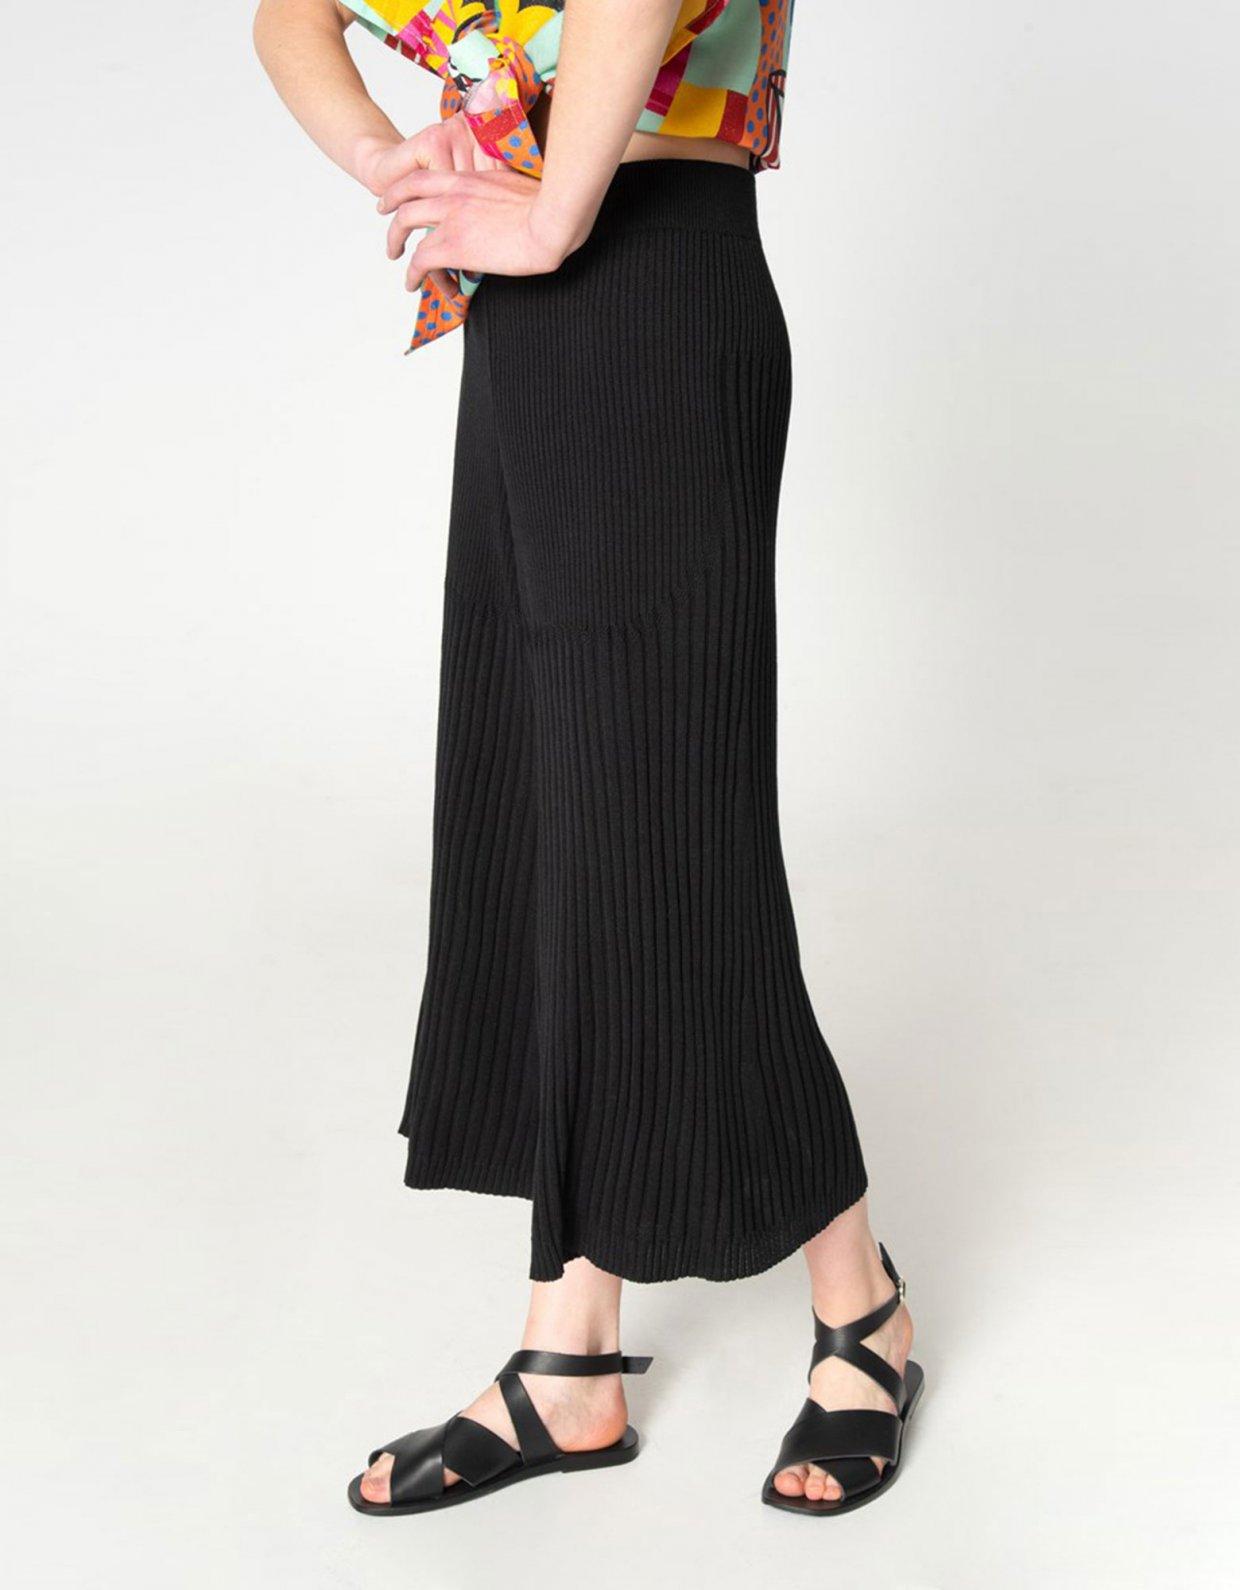 Nadia Rapti Tribes of knit pants black